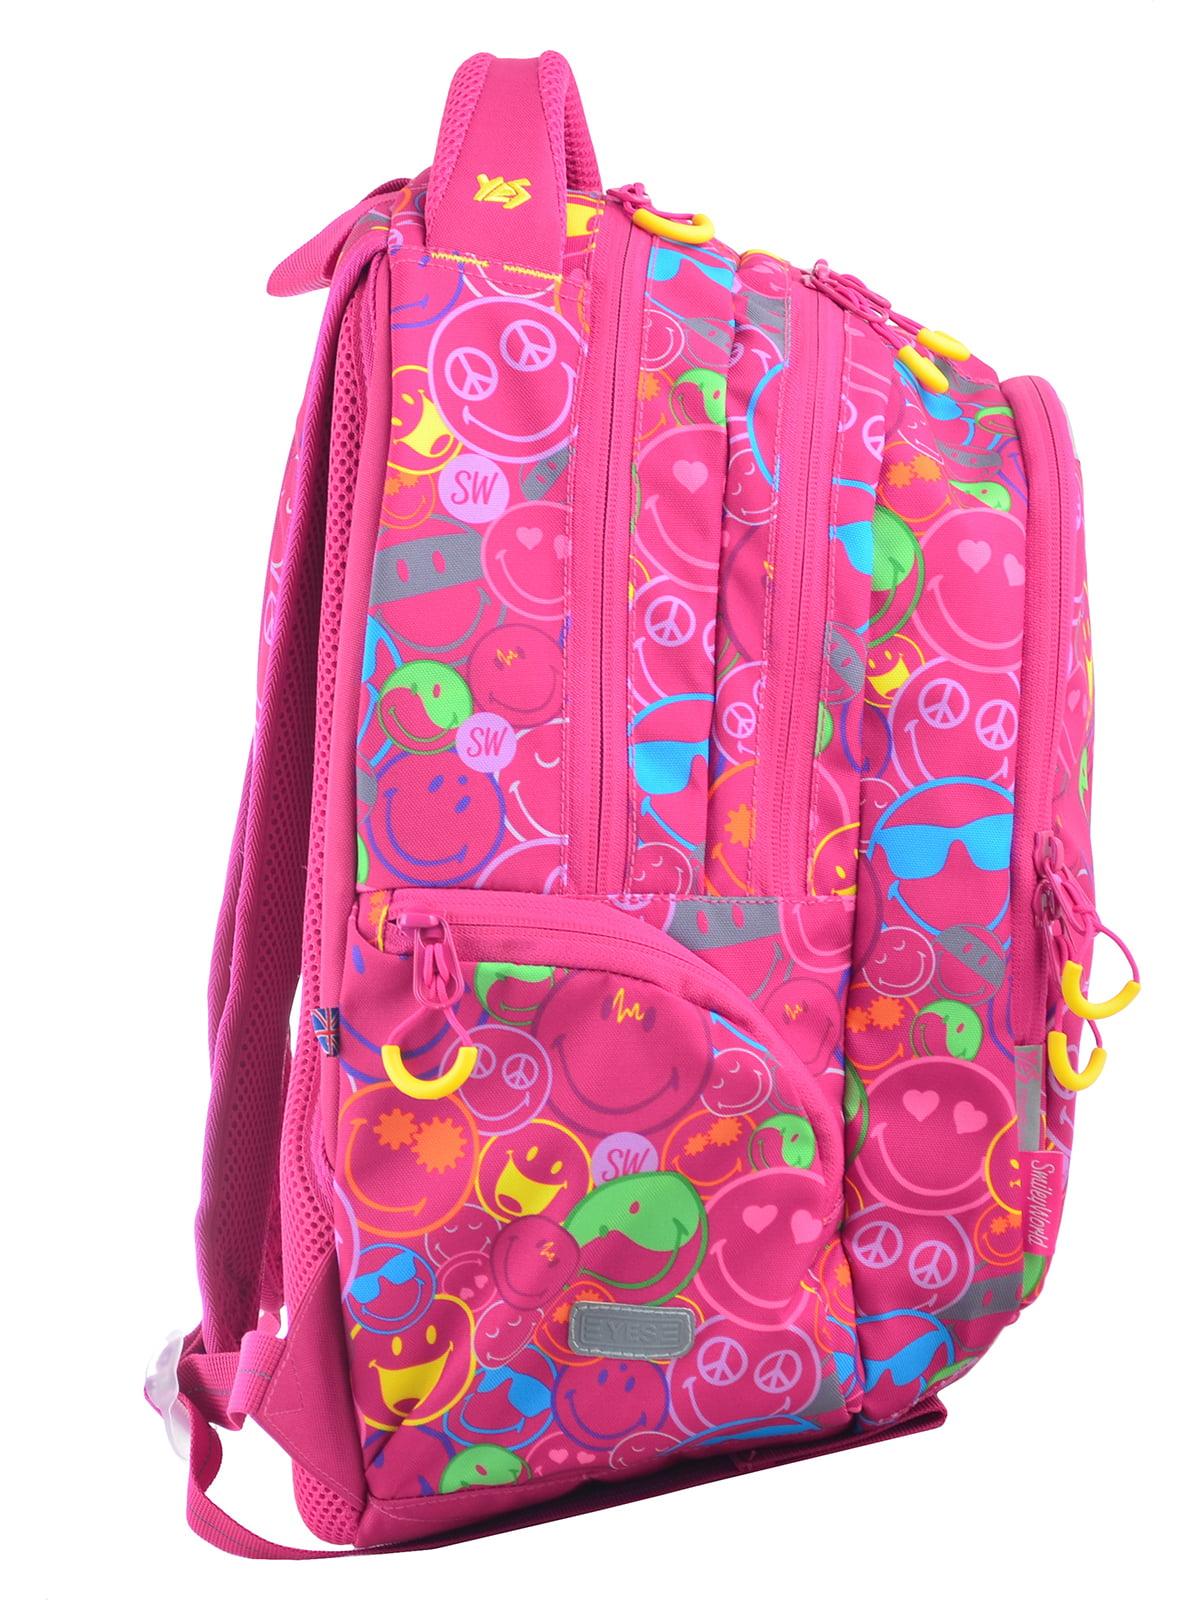 Рюкзак рожевий в принт | 4214930 | фото 2